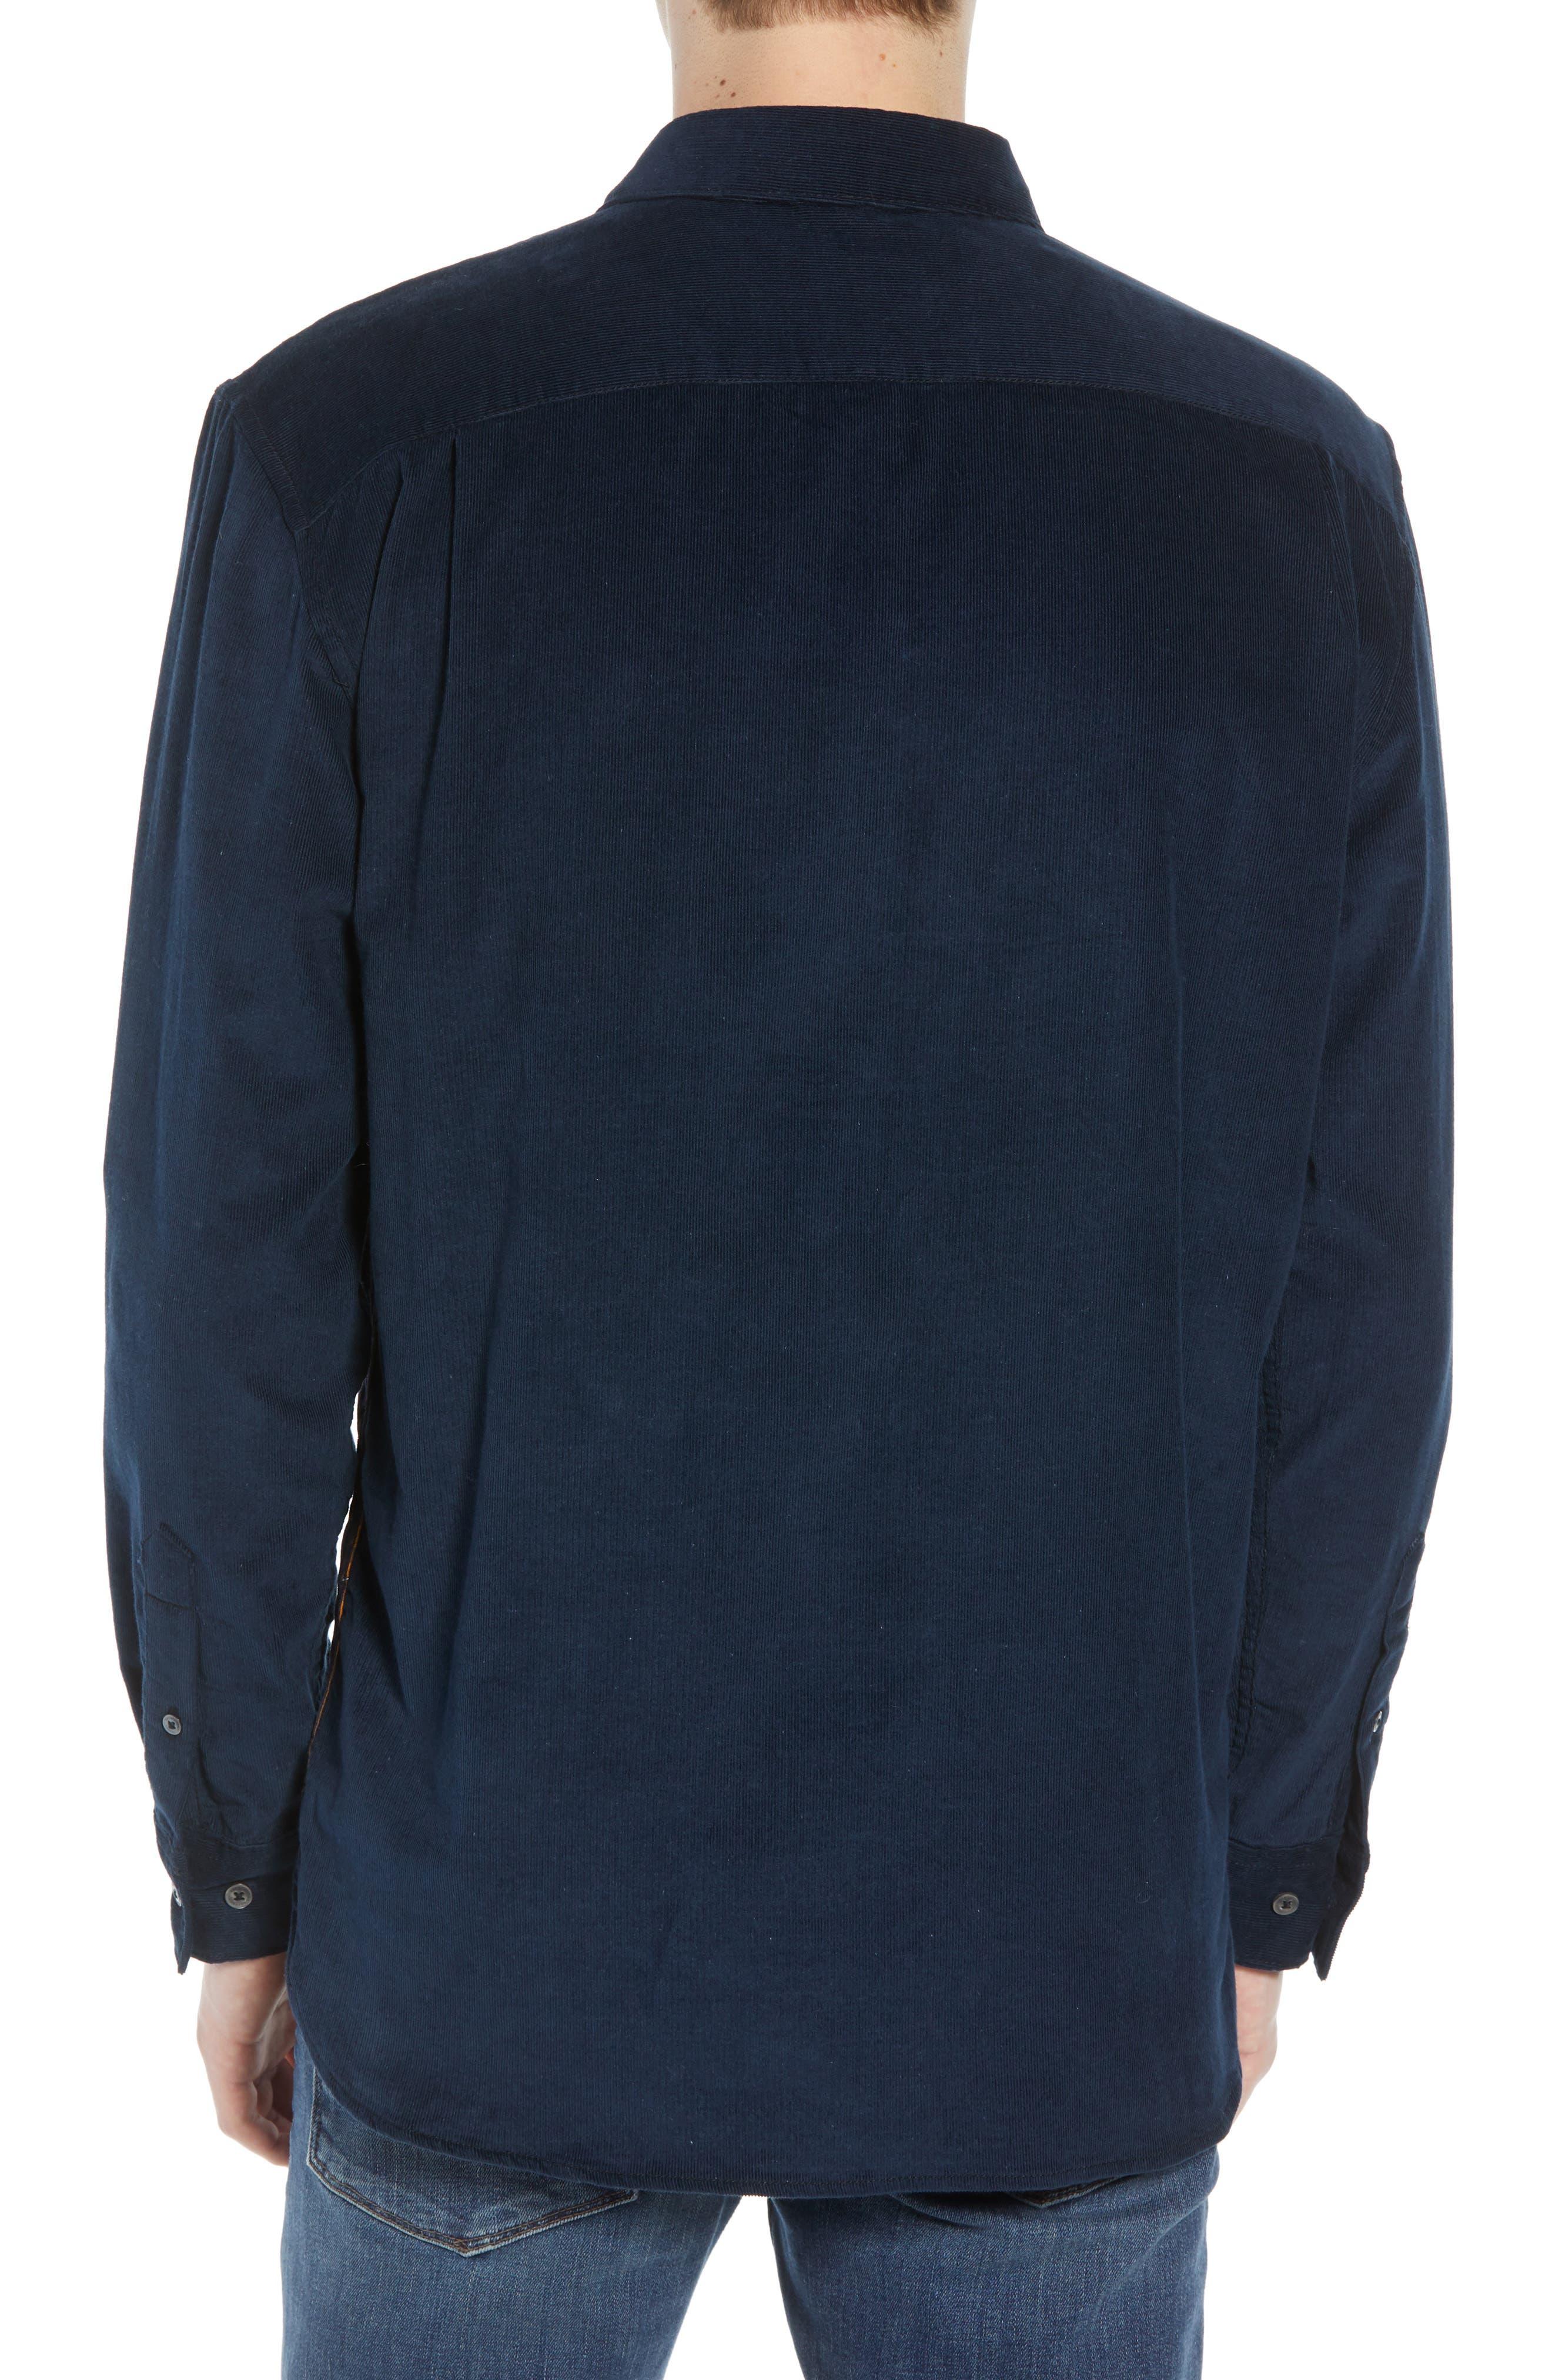 Regular Fit Check Print Corduroy Shirt,                             Alternate thumbnail 3, color,                             CALLUNA YELLOW UTILITY BLUE